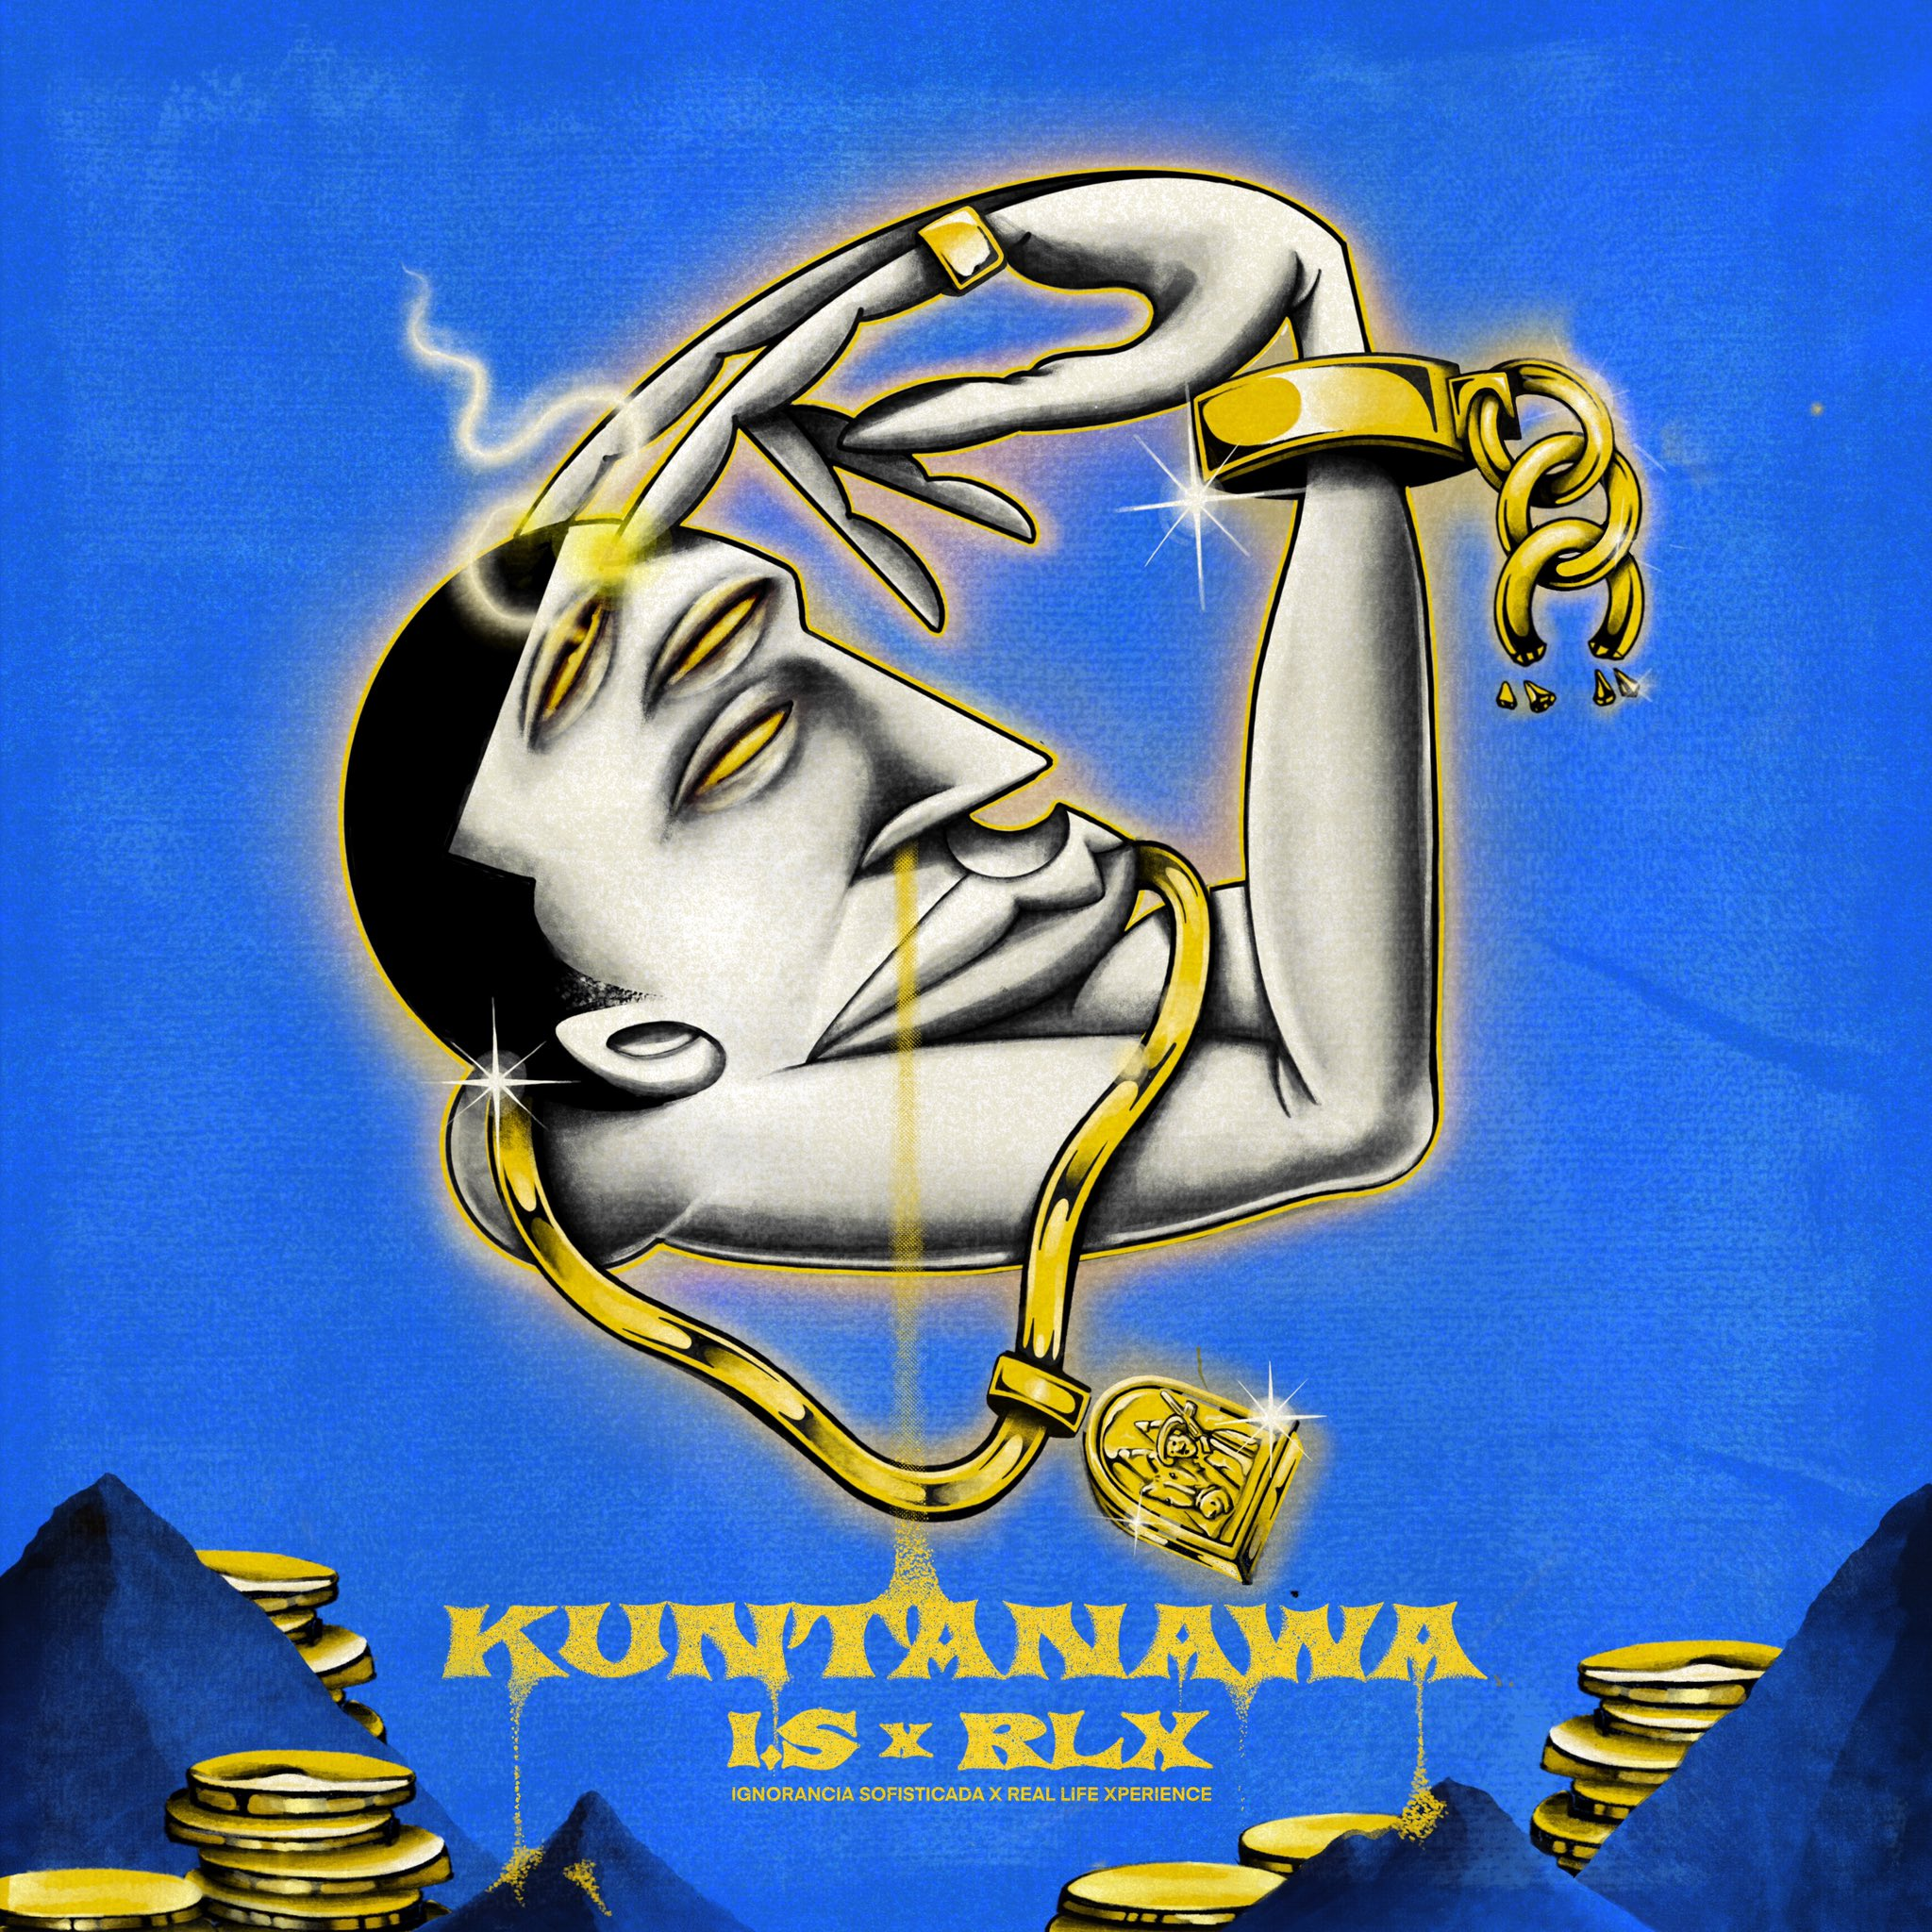 RLX, Ignorancia Sofisticada - KUNTANAWA LP